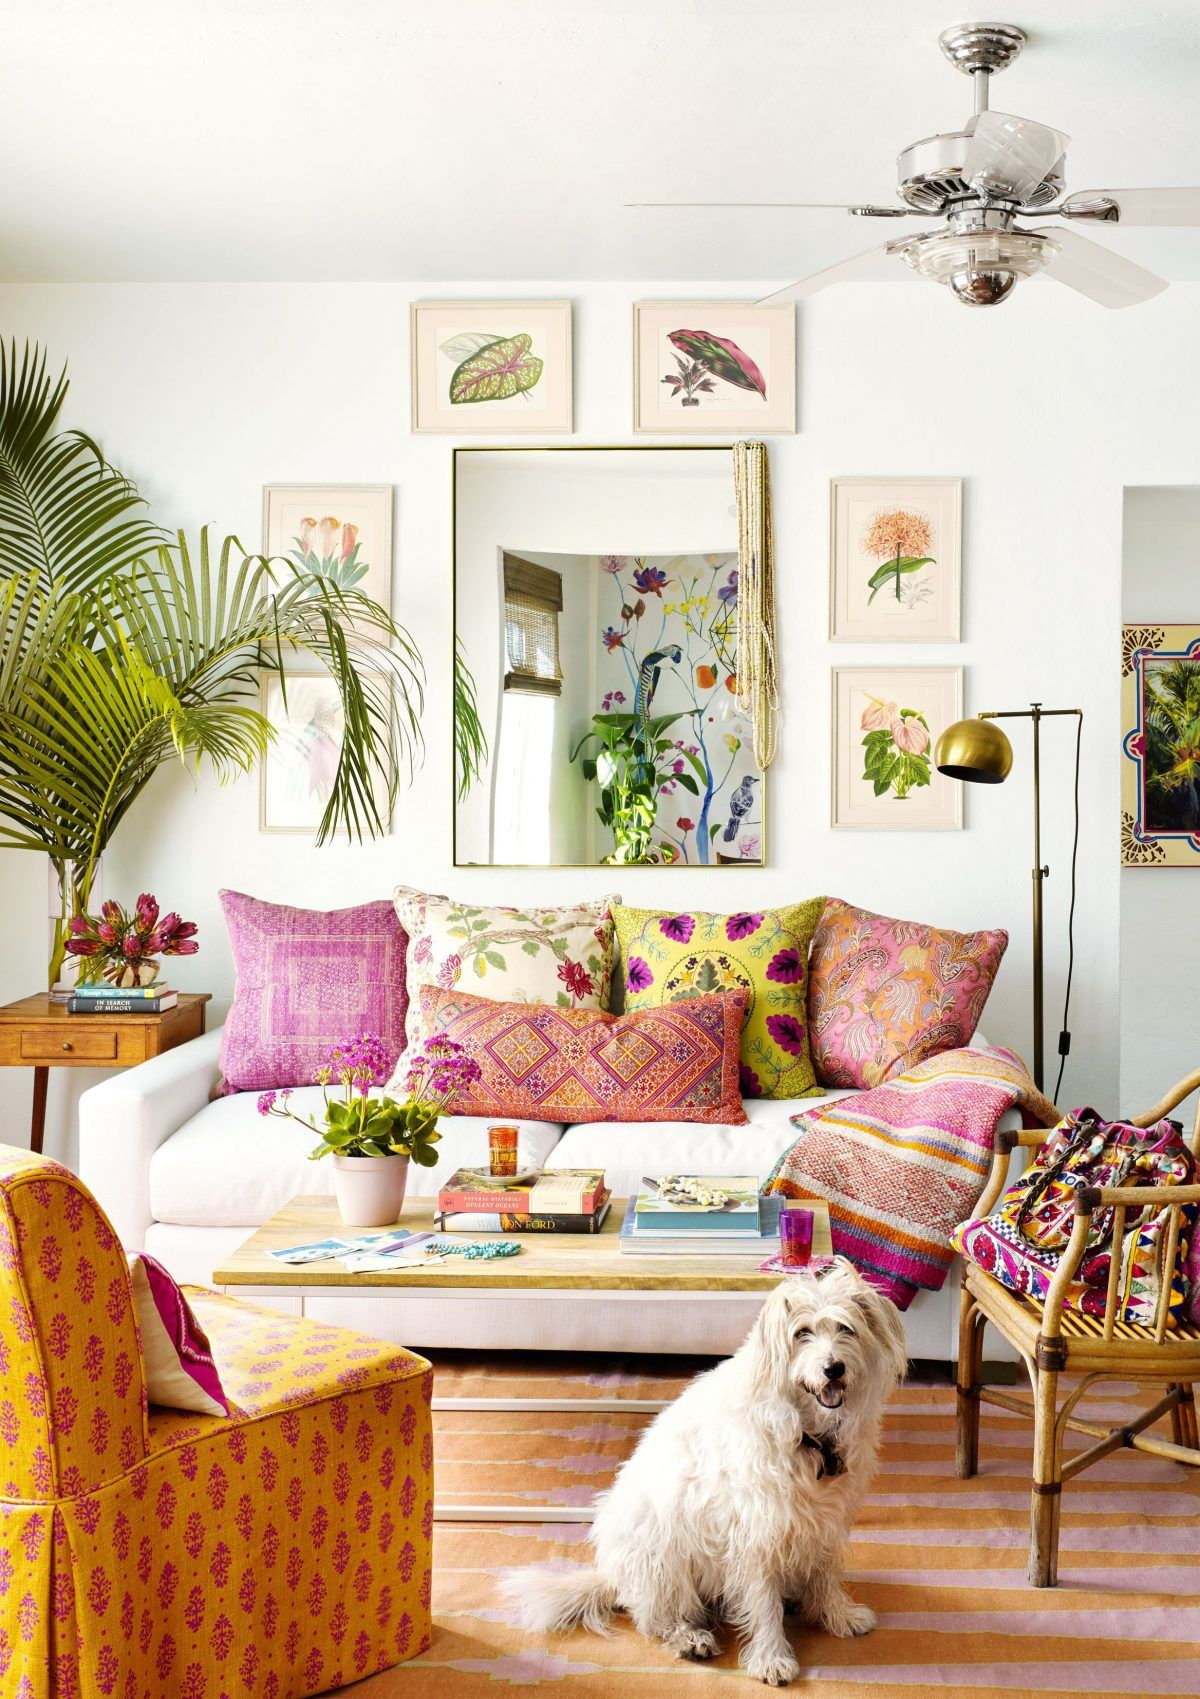 3 tips to create a tasteful bohemian style home boho living room bohemian room decor coastal on boho chic decor living room bohemian kitchen id=26251